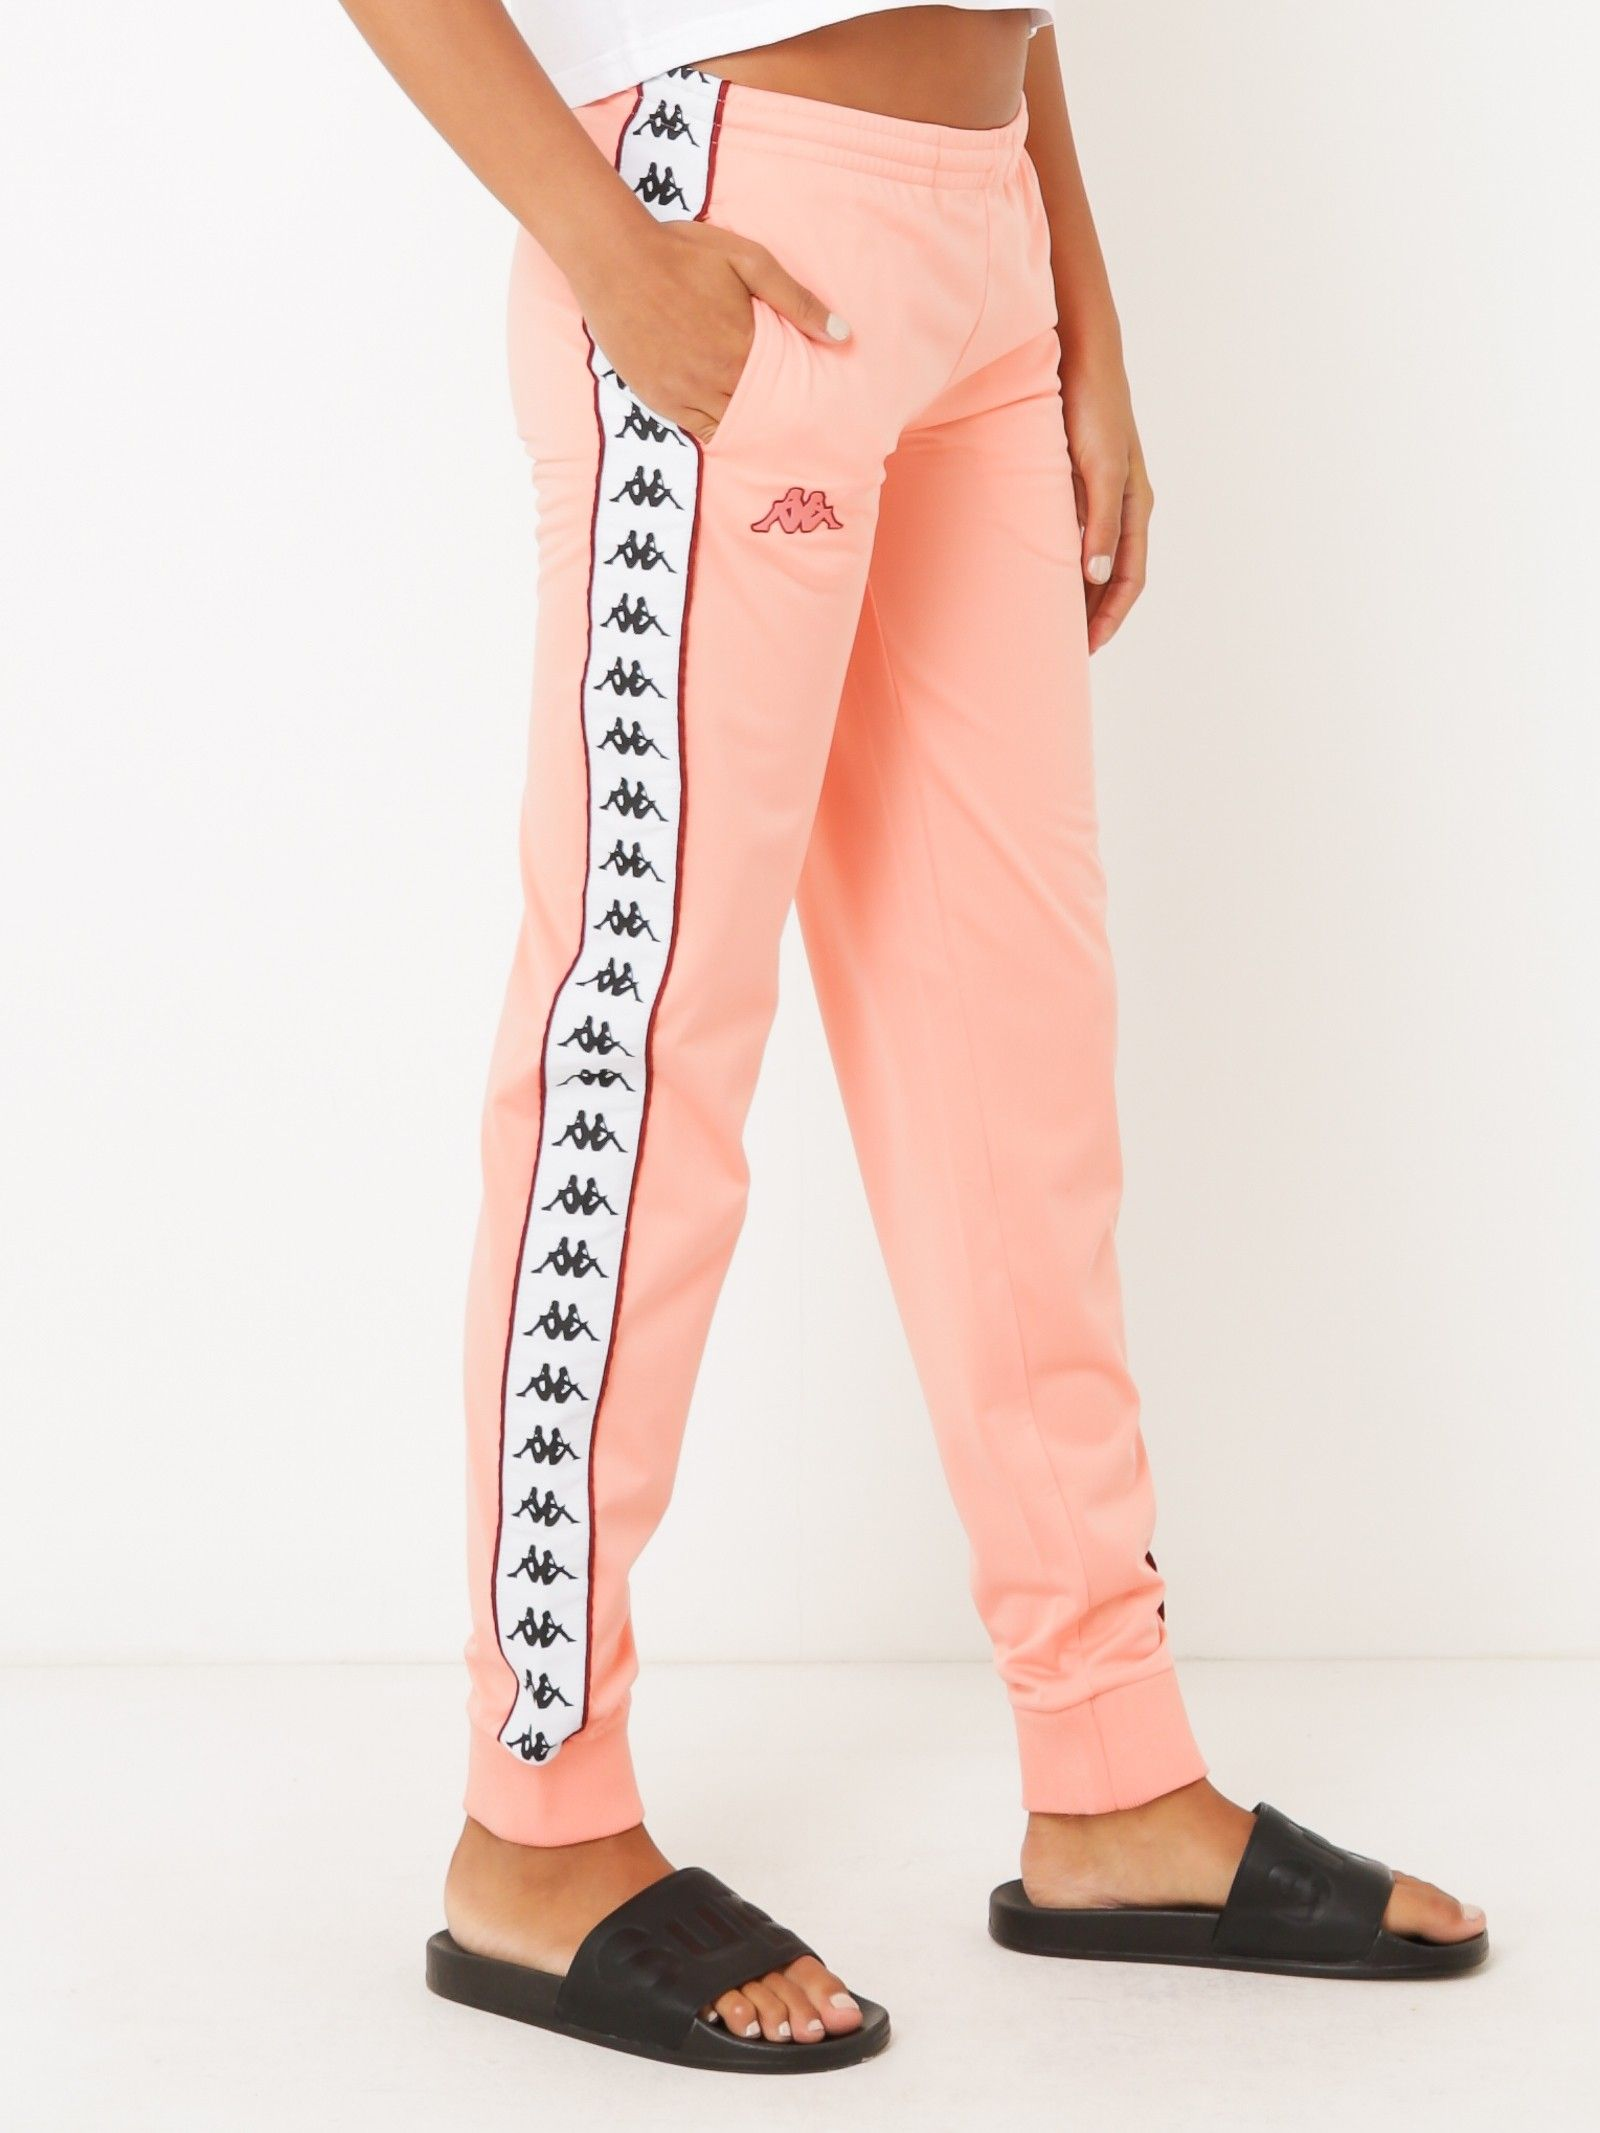 8a8fbb1b602fa4 222 Banda Astoria Slim Track Pants in Pink